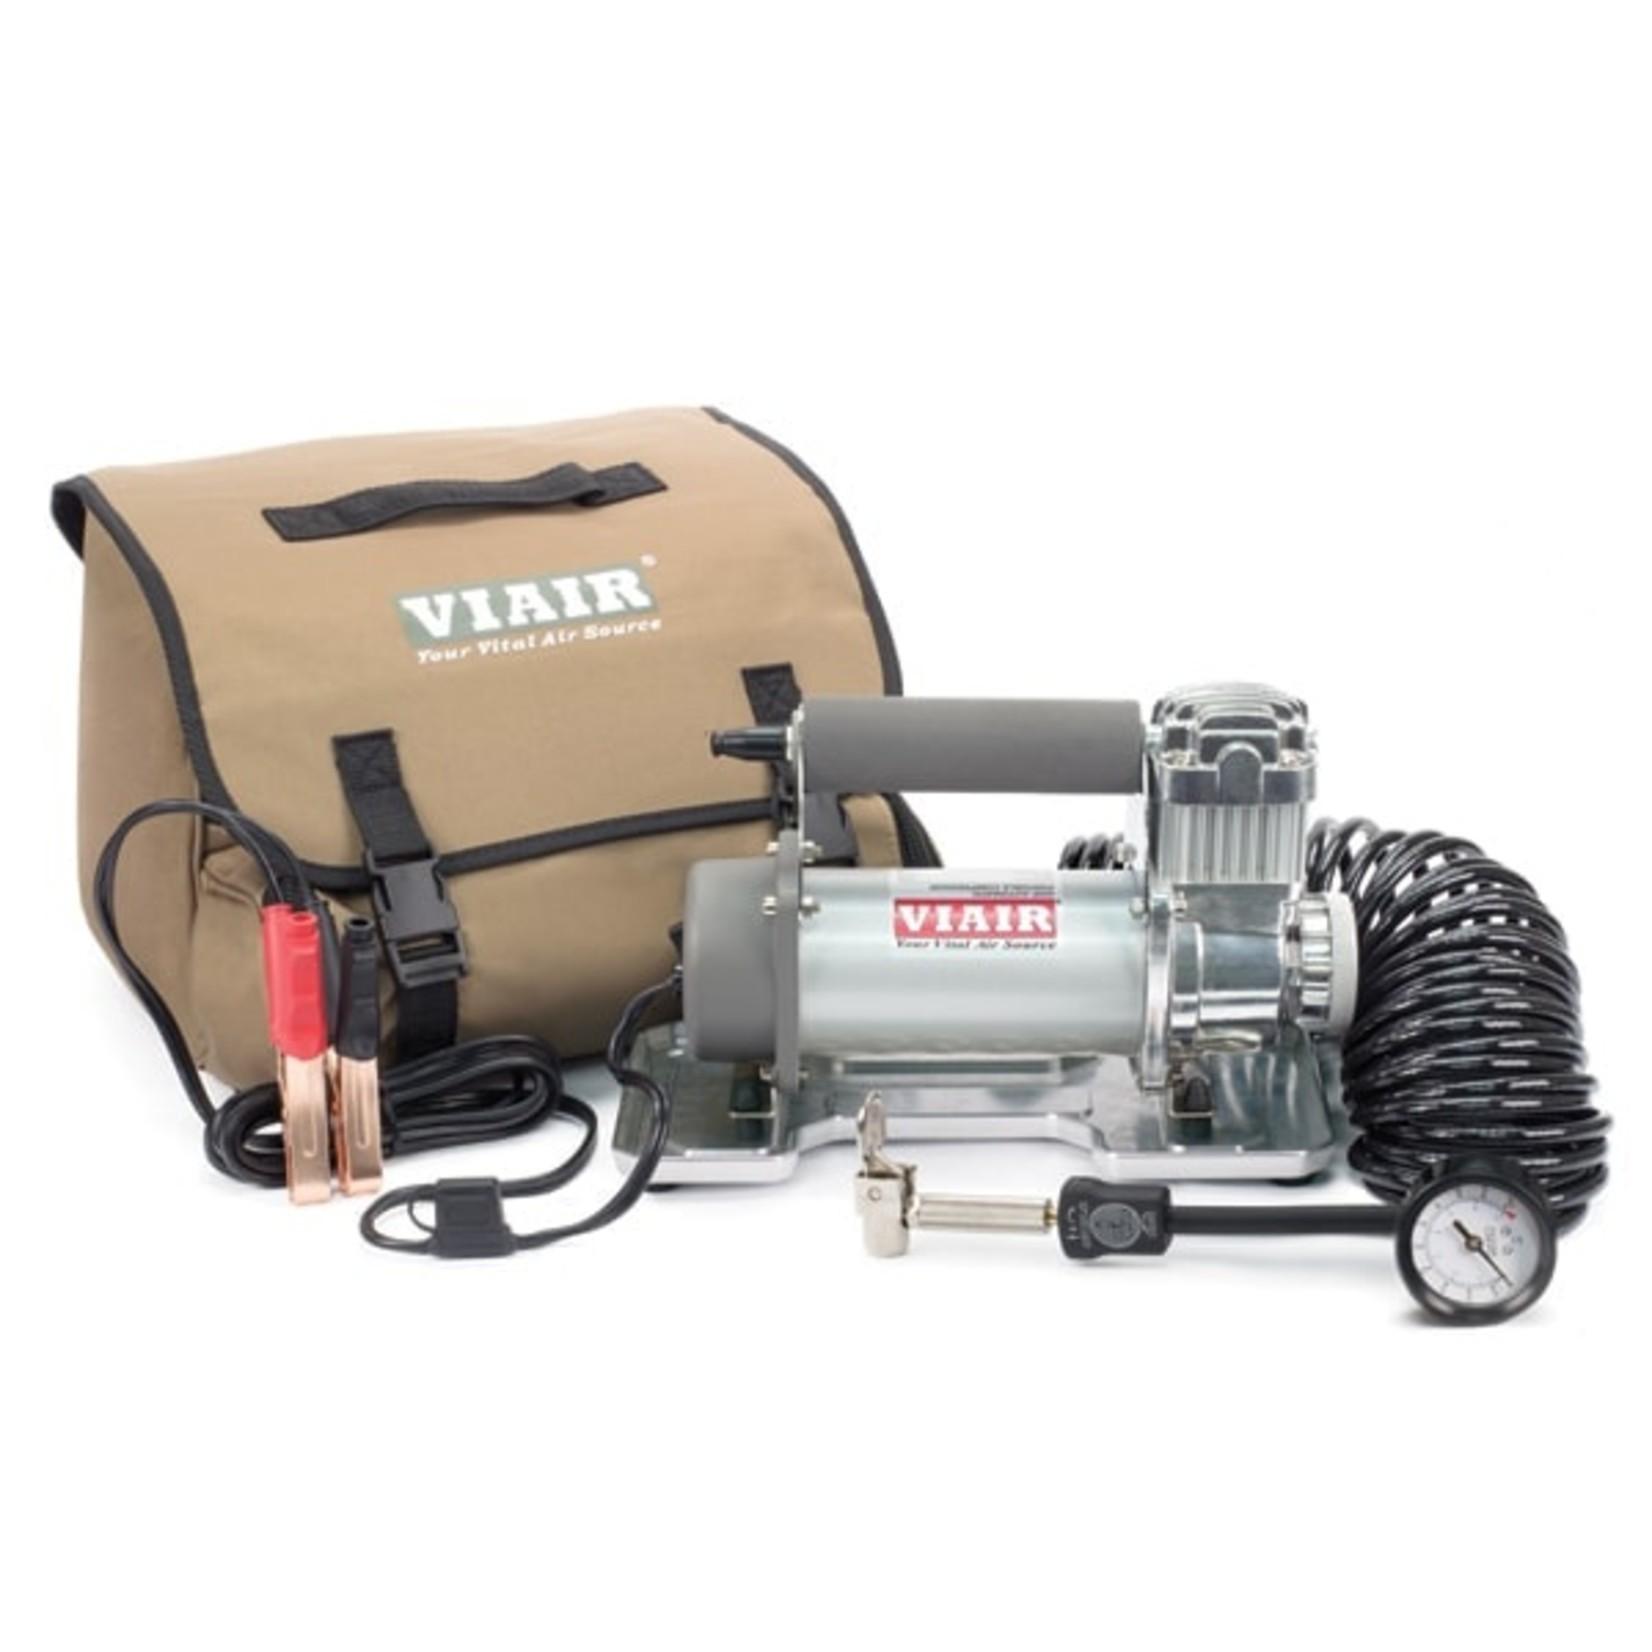 ViAir 400P Portable Air Compressor Kit